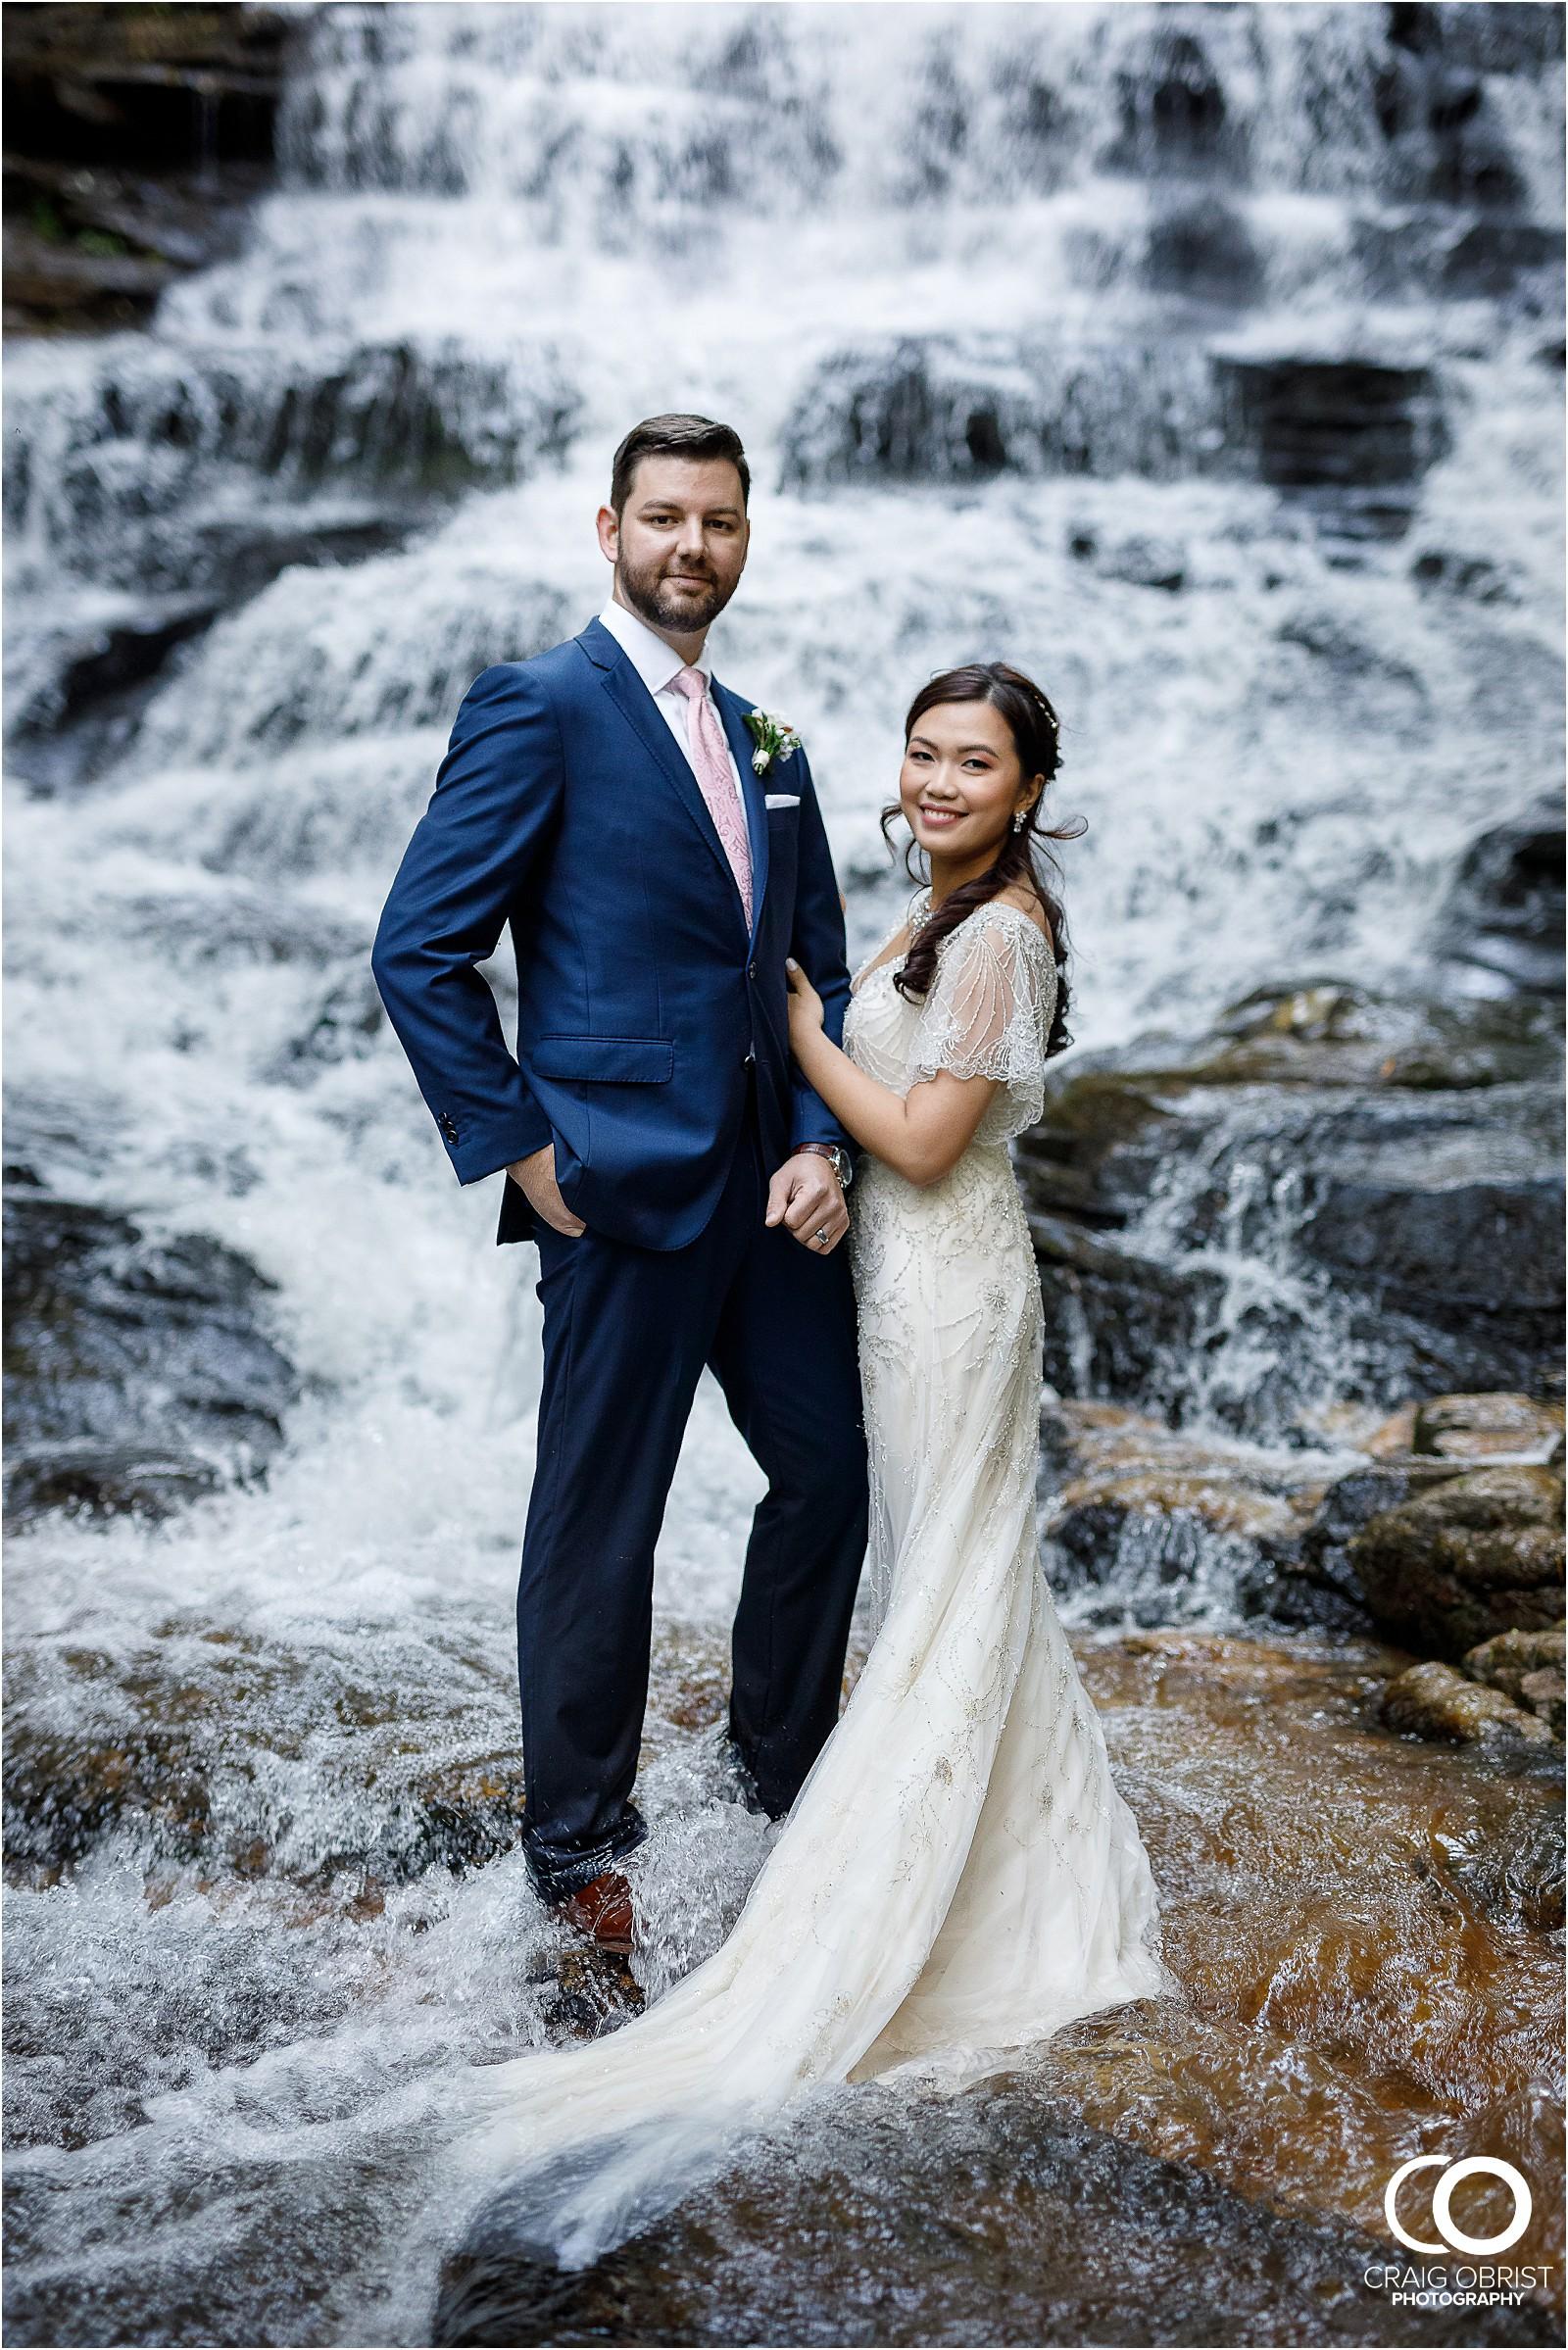 Waterfall Wedding Portraits Elopement Georgia_0026.jpg